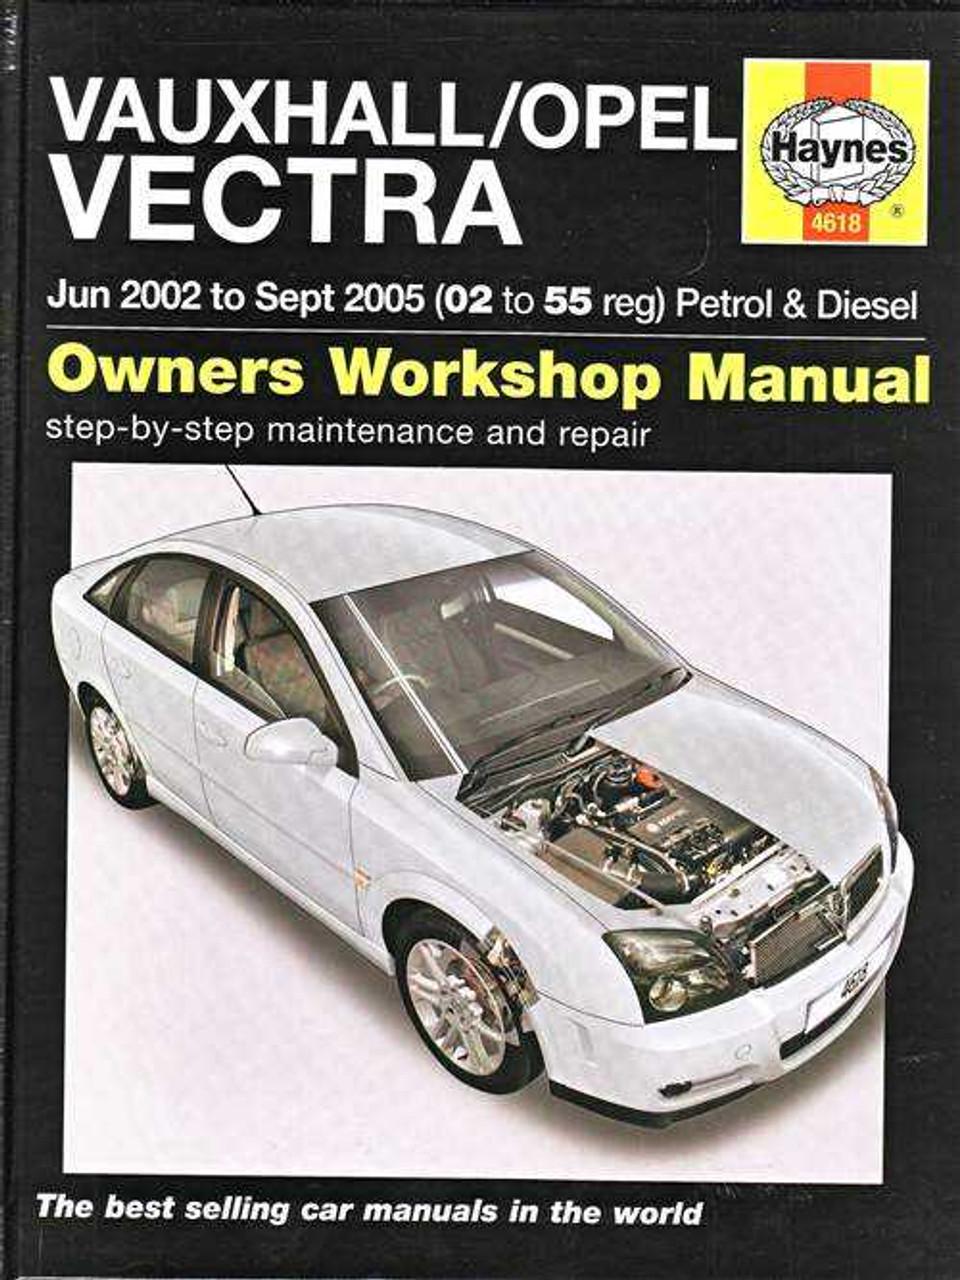 vauxhall vectra manual 2002 free owners manual u2022 rh wordworksbysea com vectra b repair manual pdf opel vectra b repair manual